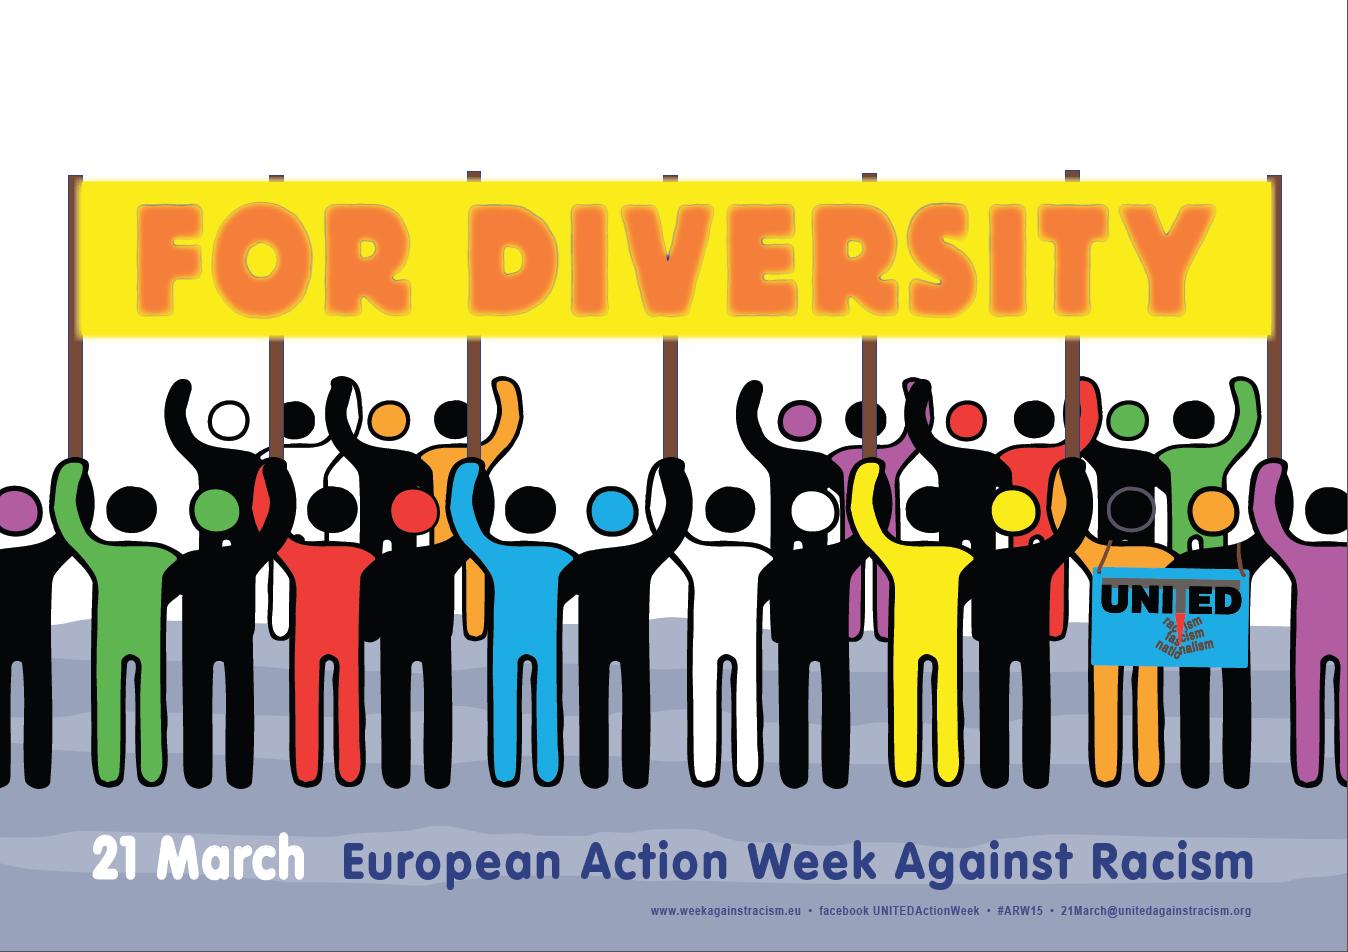 European Action Week Against Racism – join us!